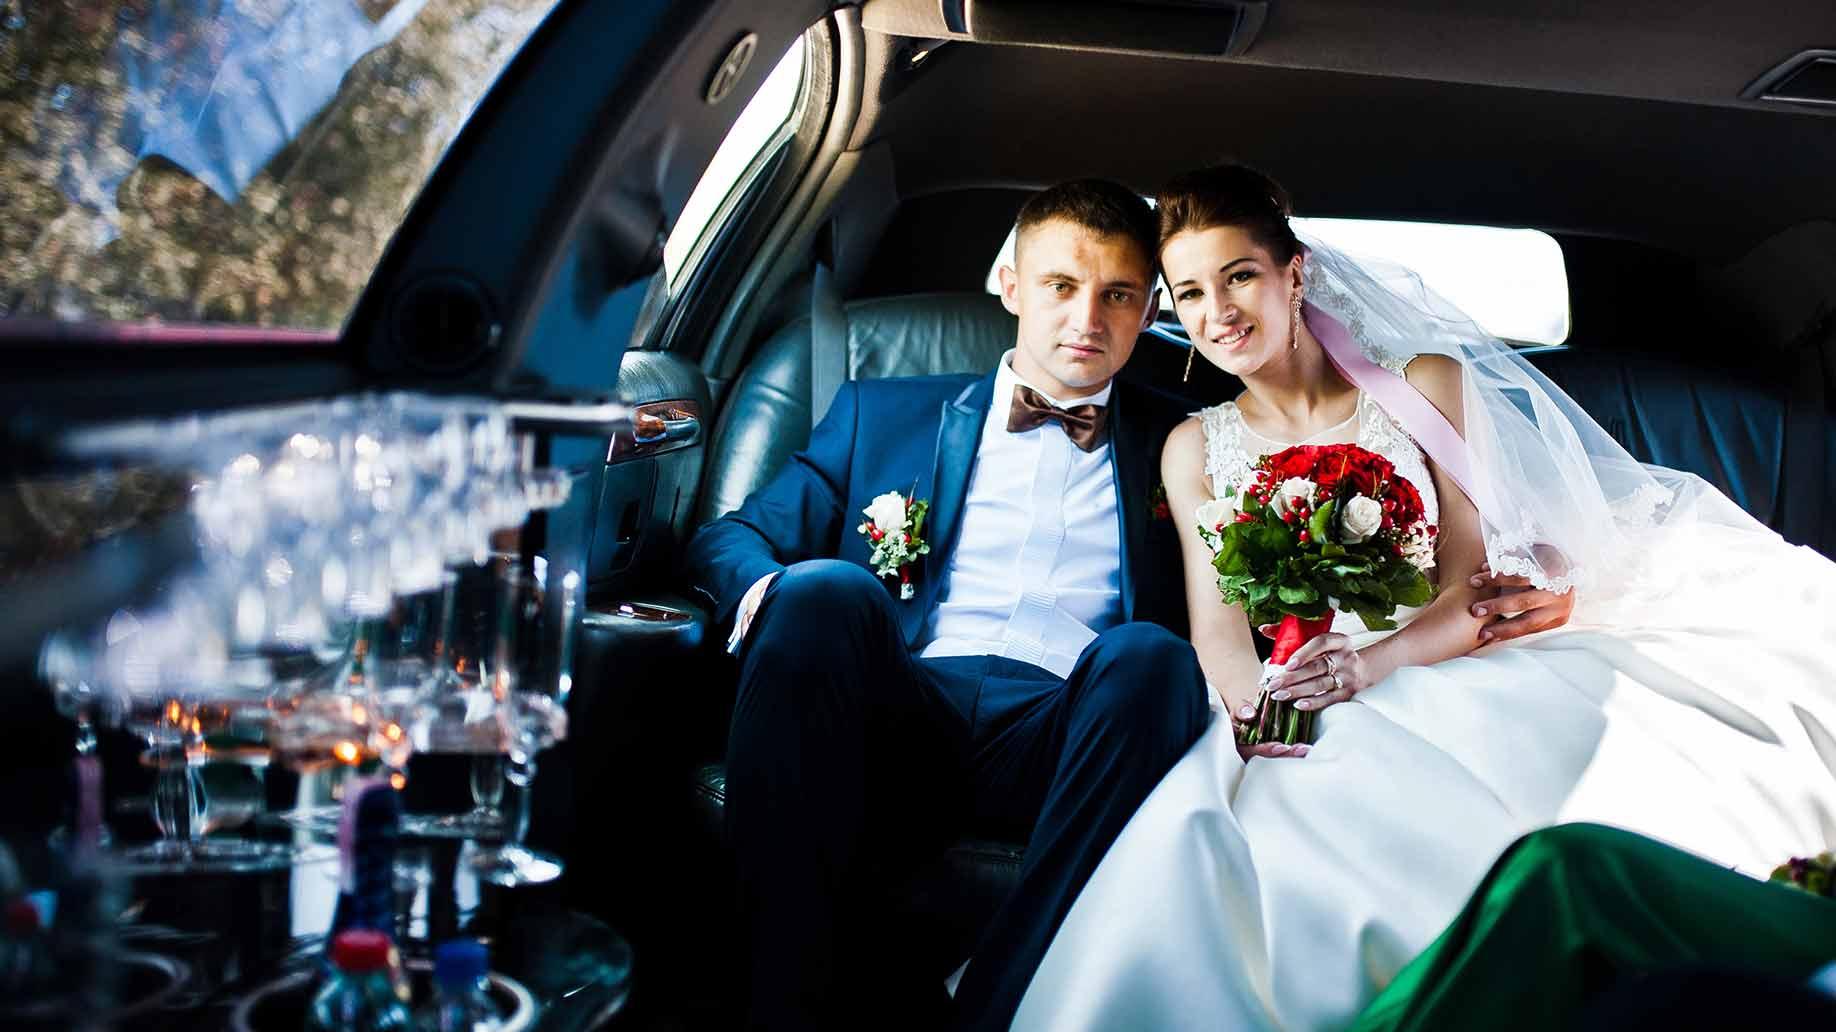 wedding limo couple